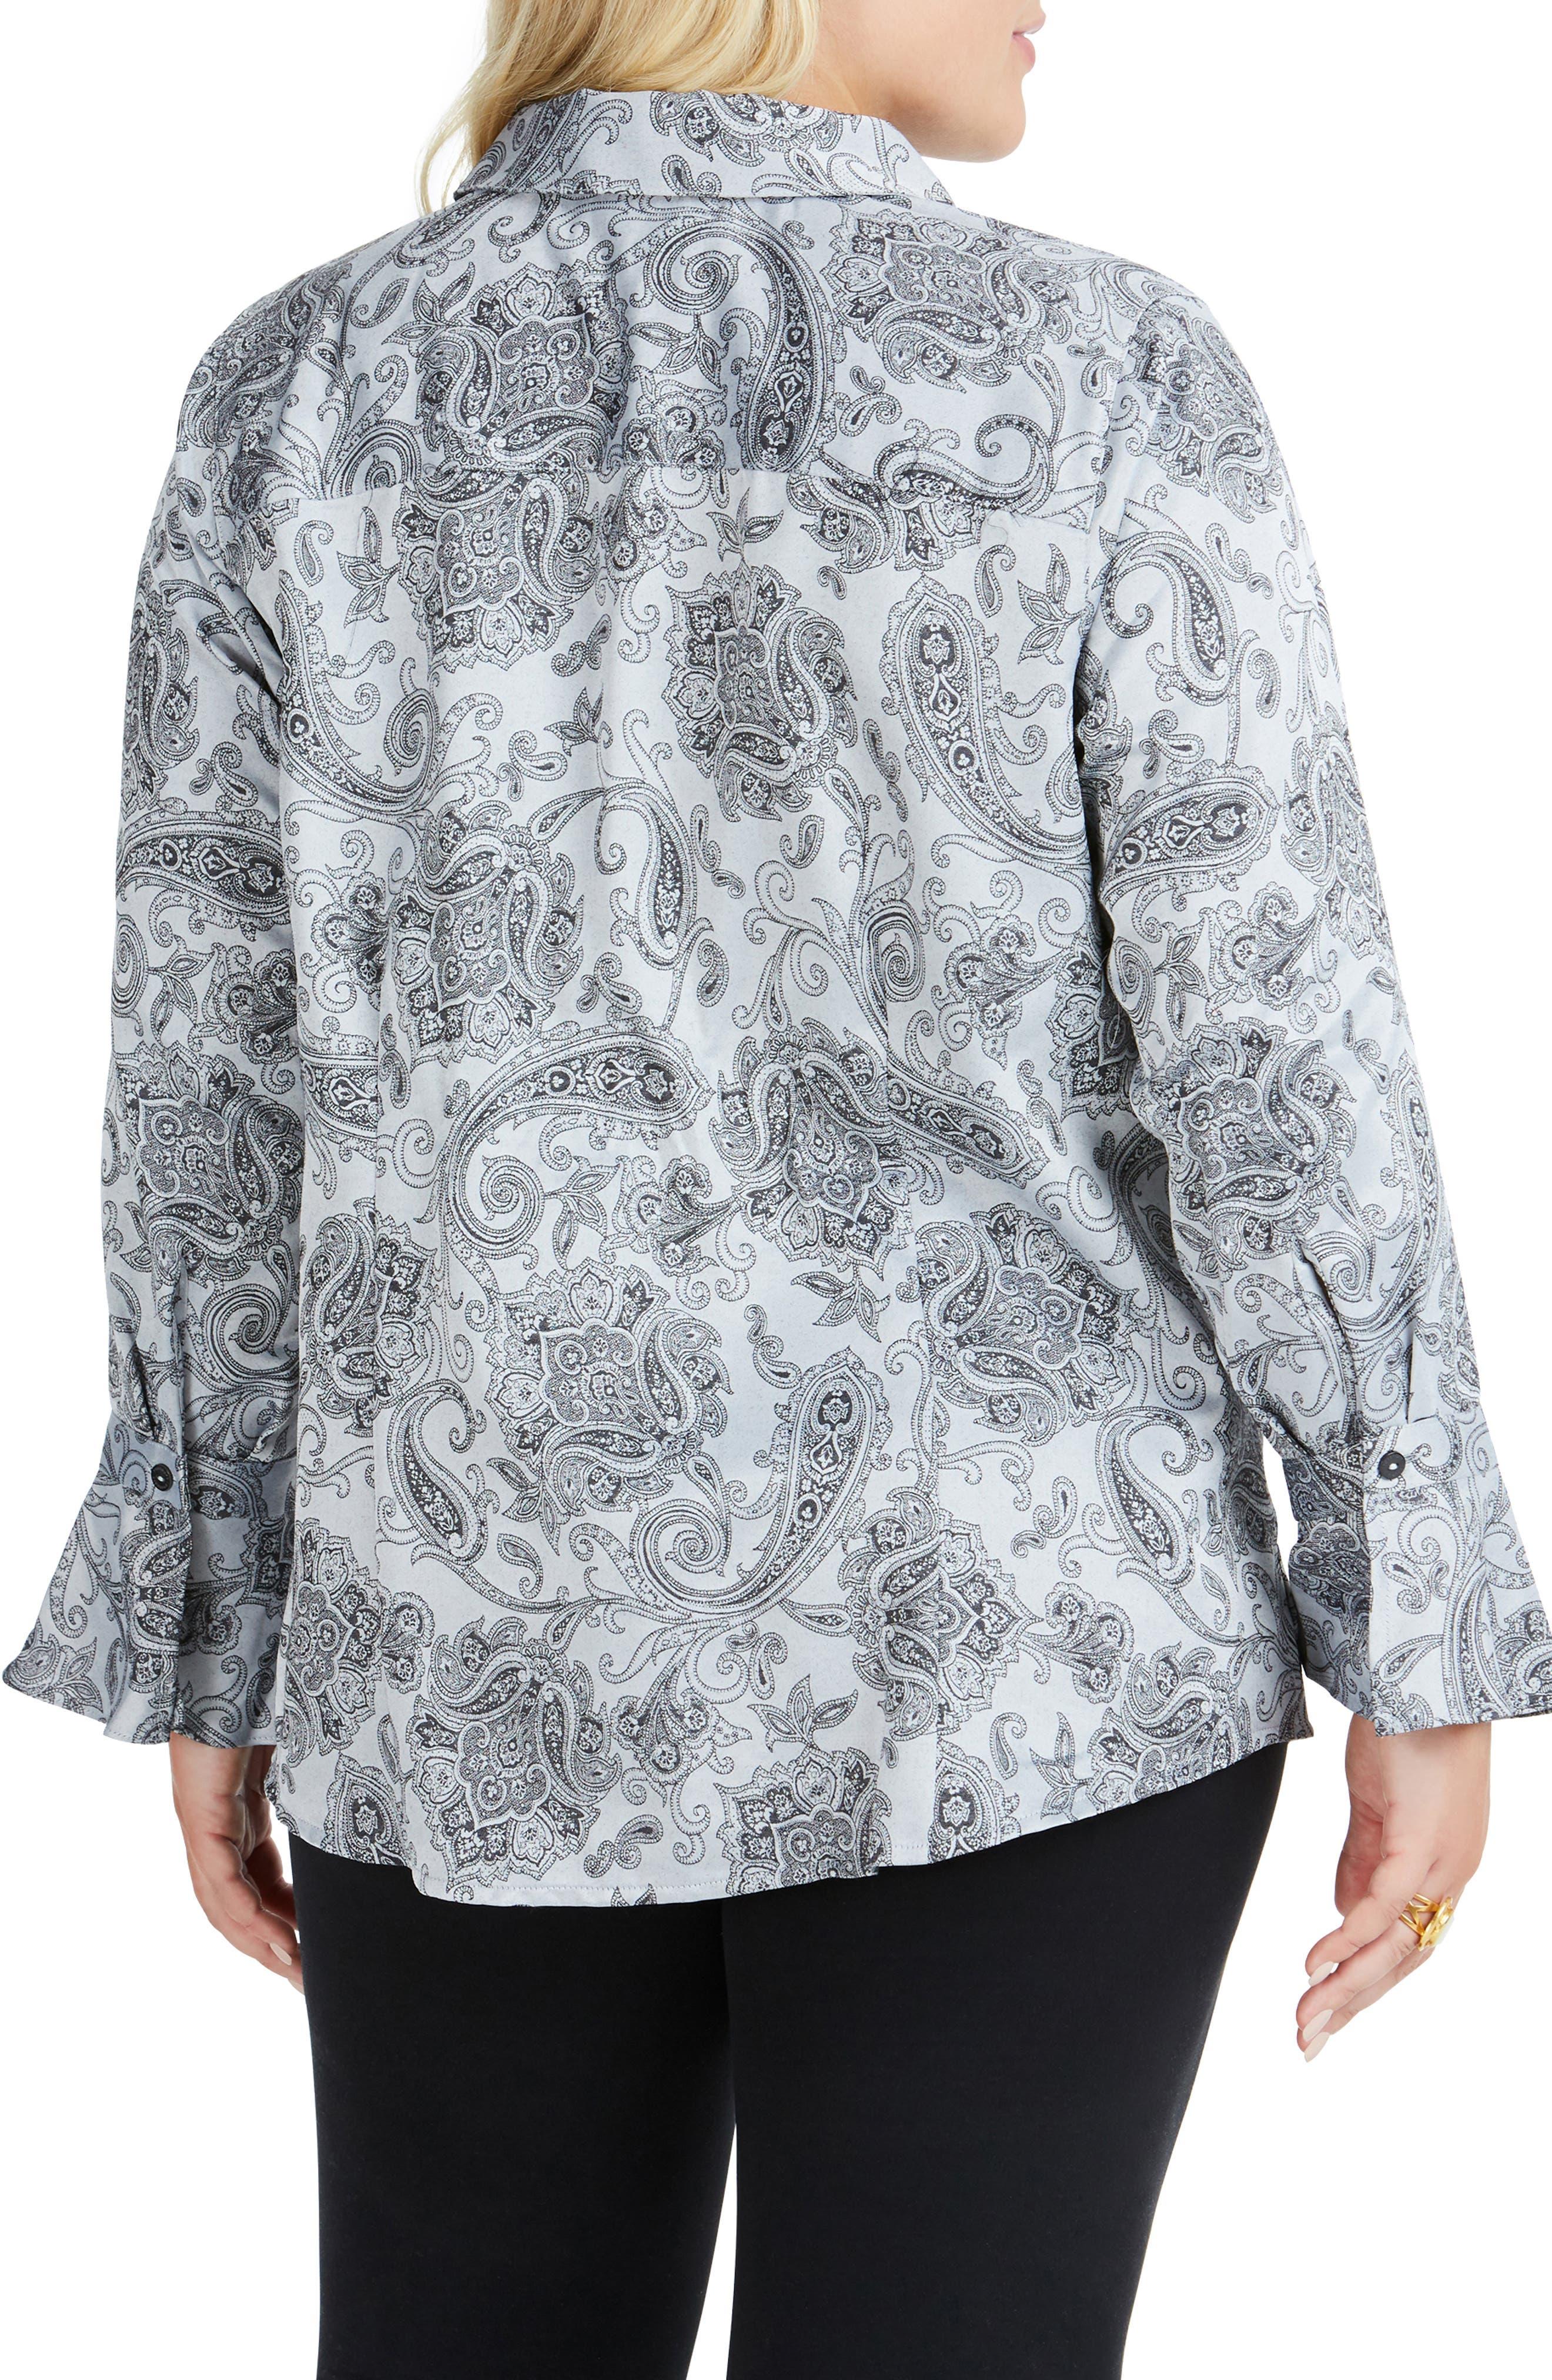 Ellery Paisley Jacquard Shirt,                             Alternate thumbnail 2, color,                             STERLING